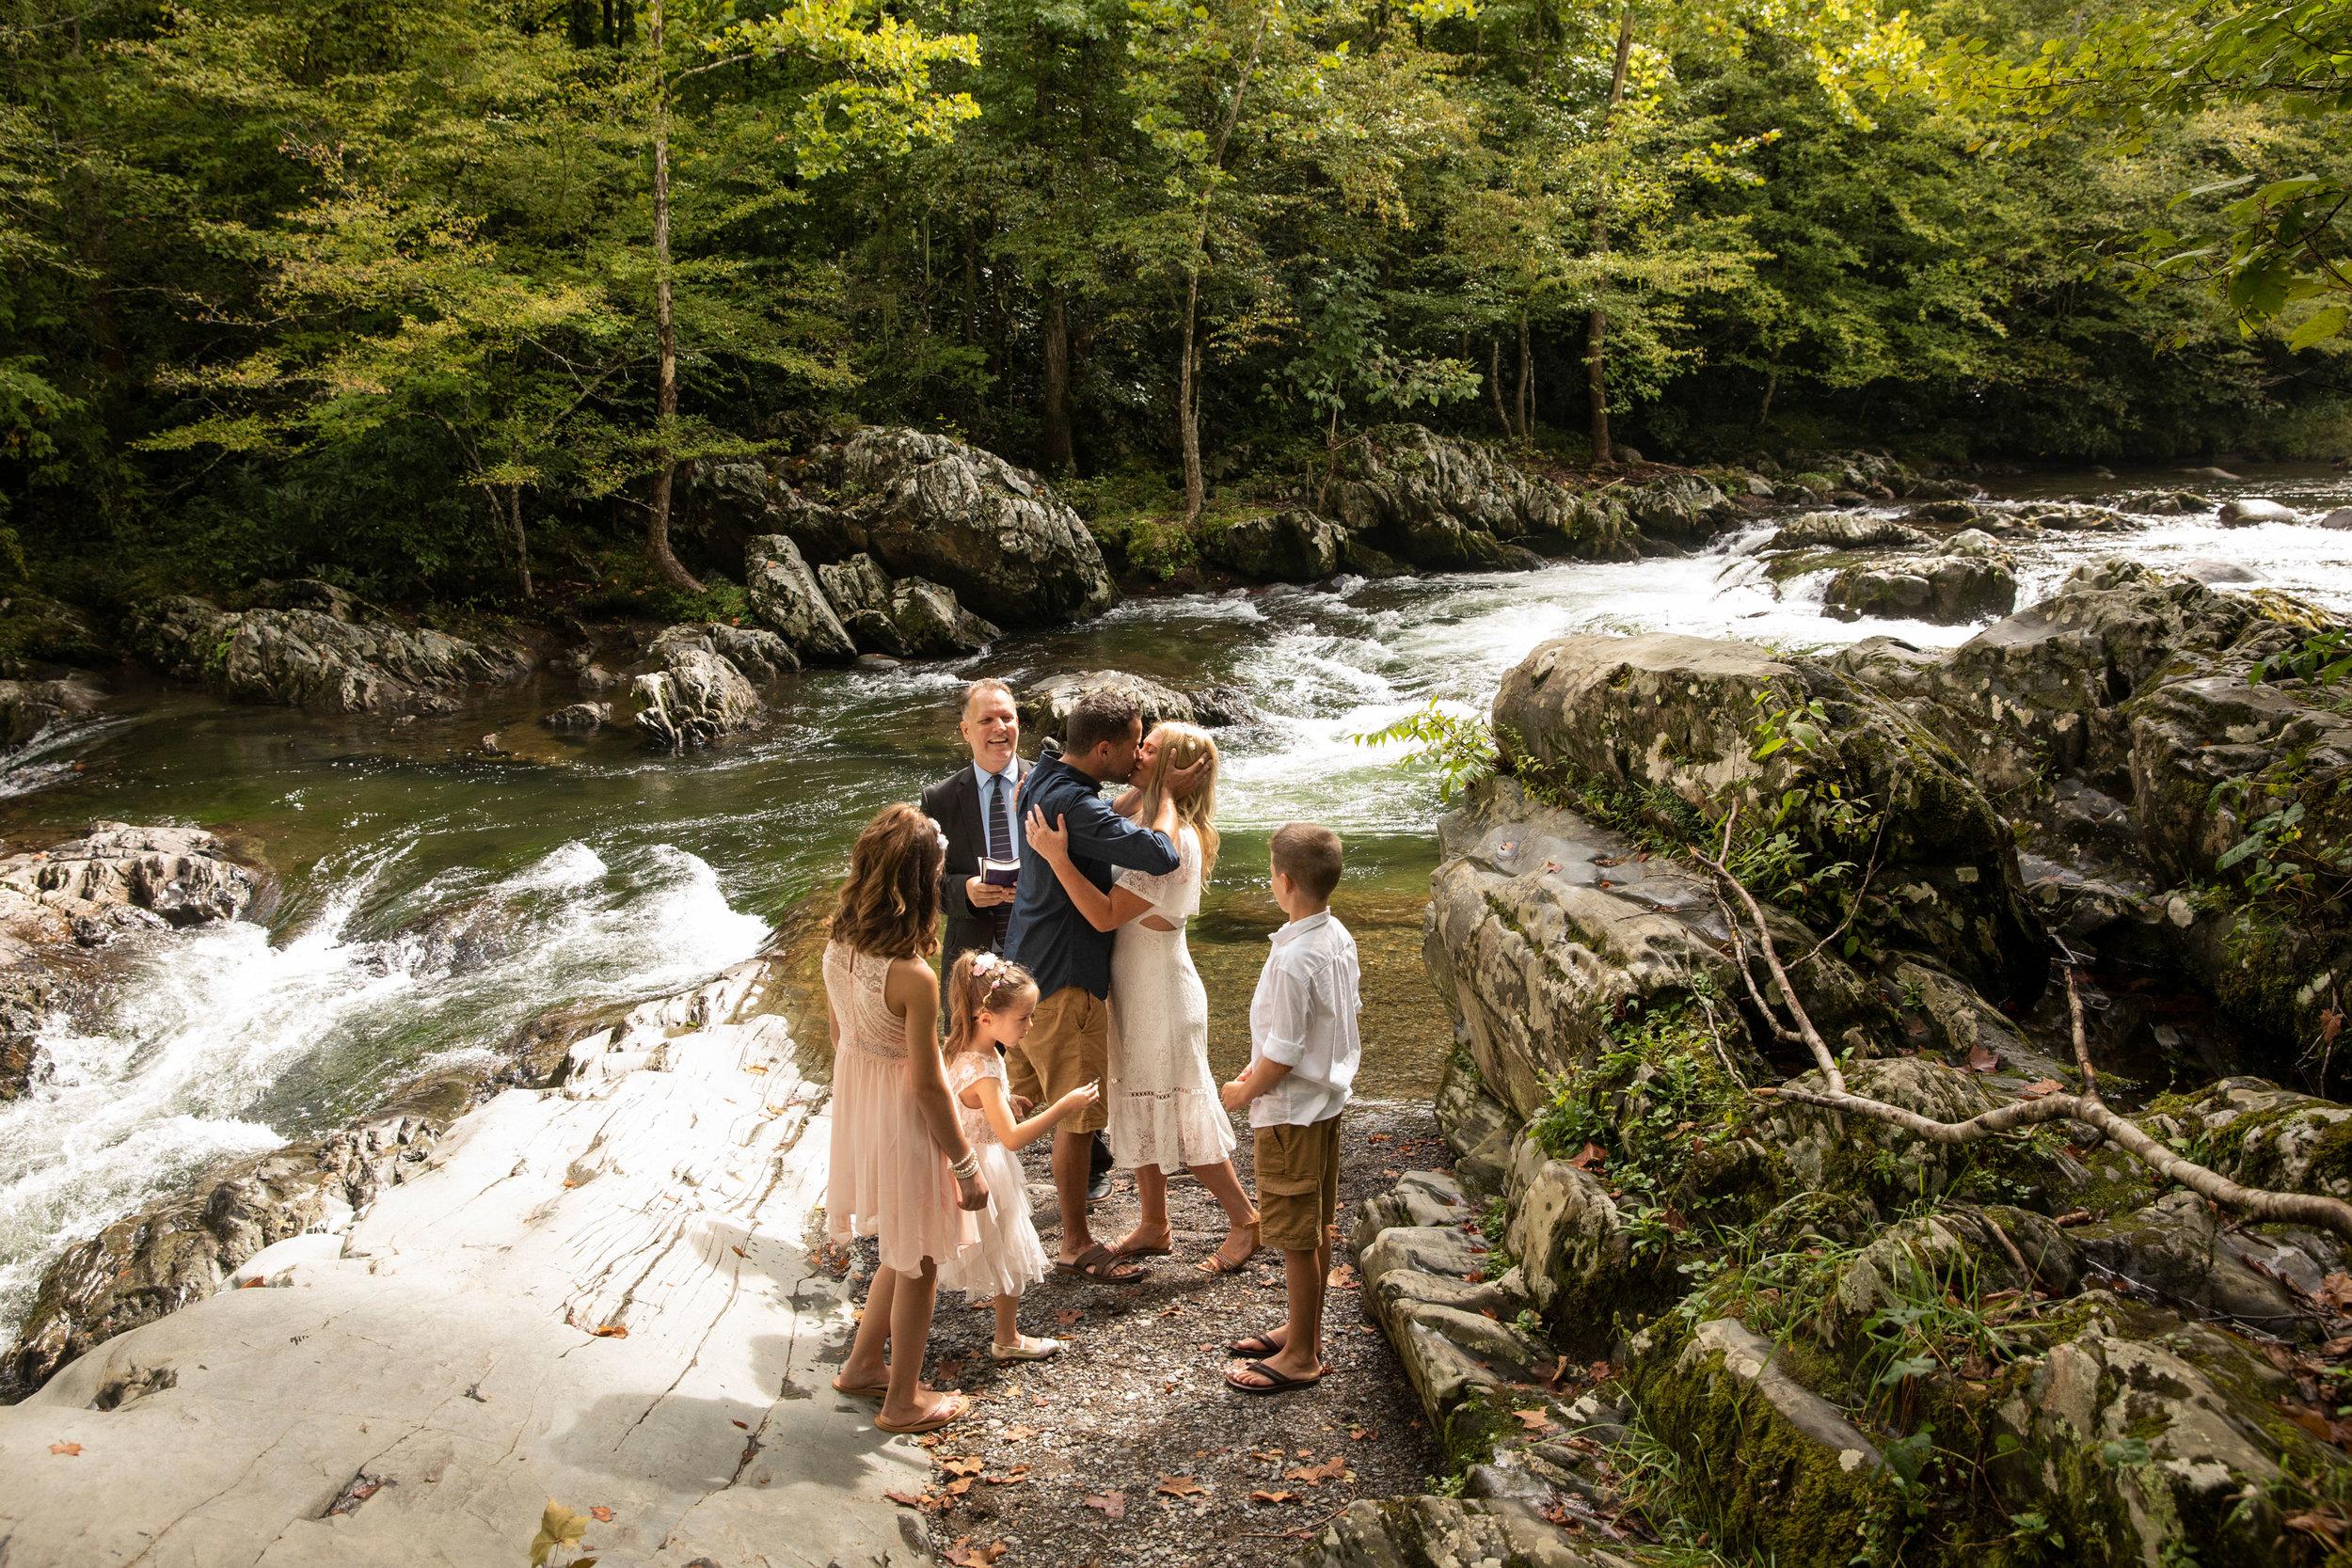 gatlinburg-wedding-officiant-and-photographer-service-for-elopement.jpg